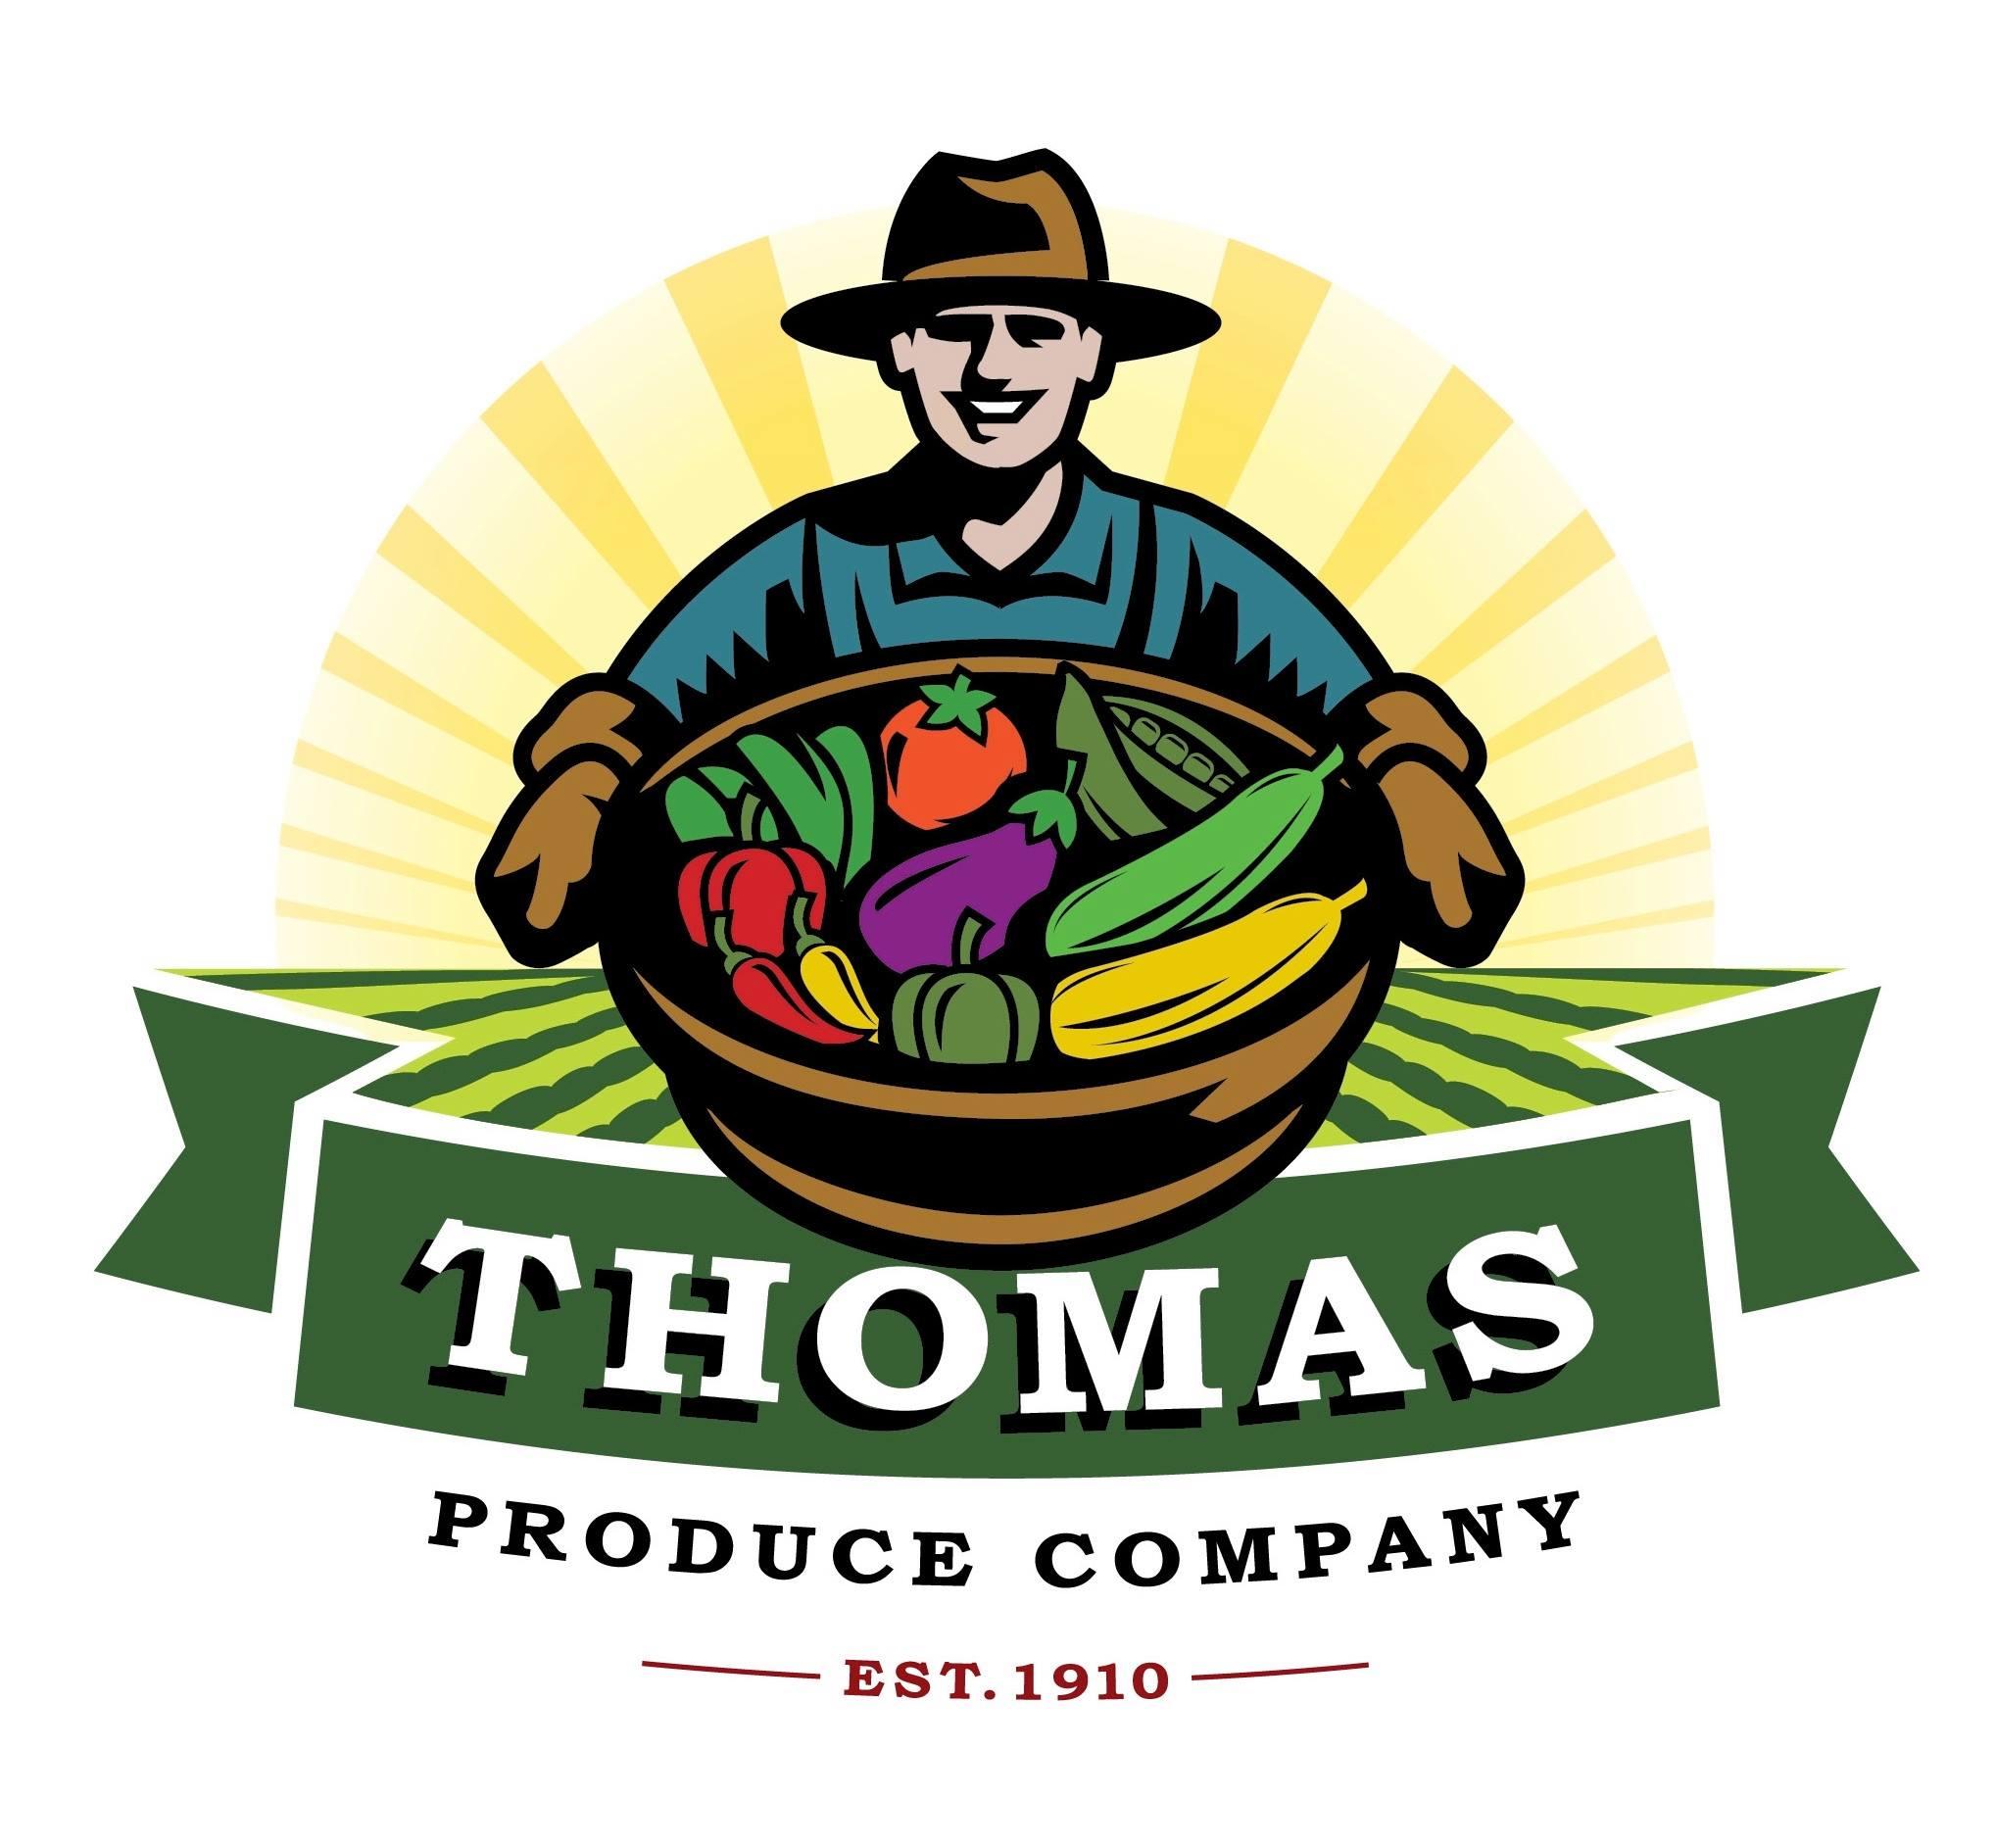 Thomas Produce Company Questions